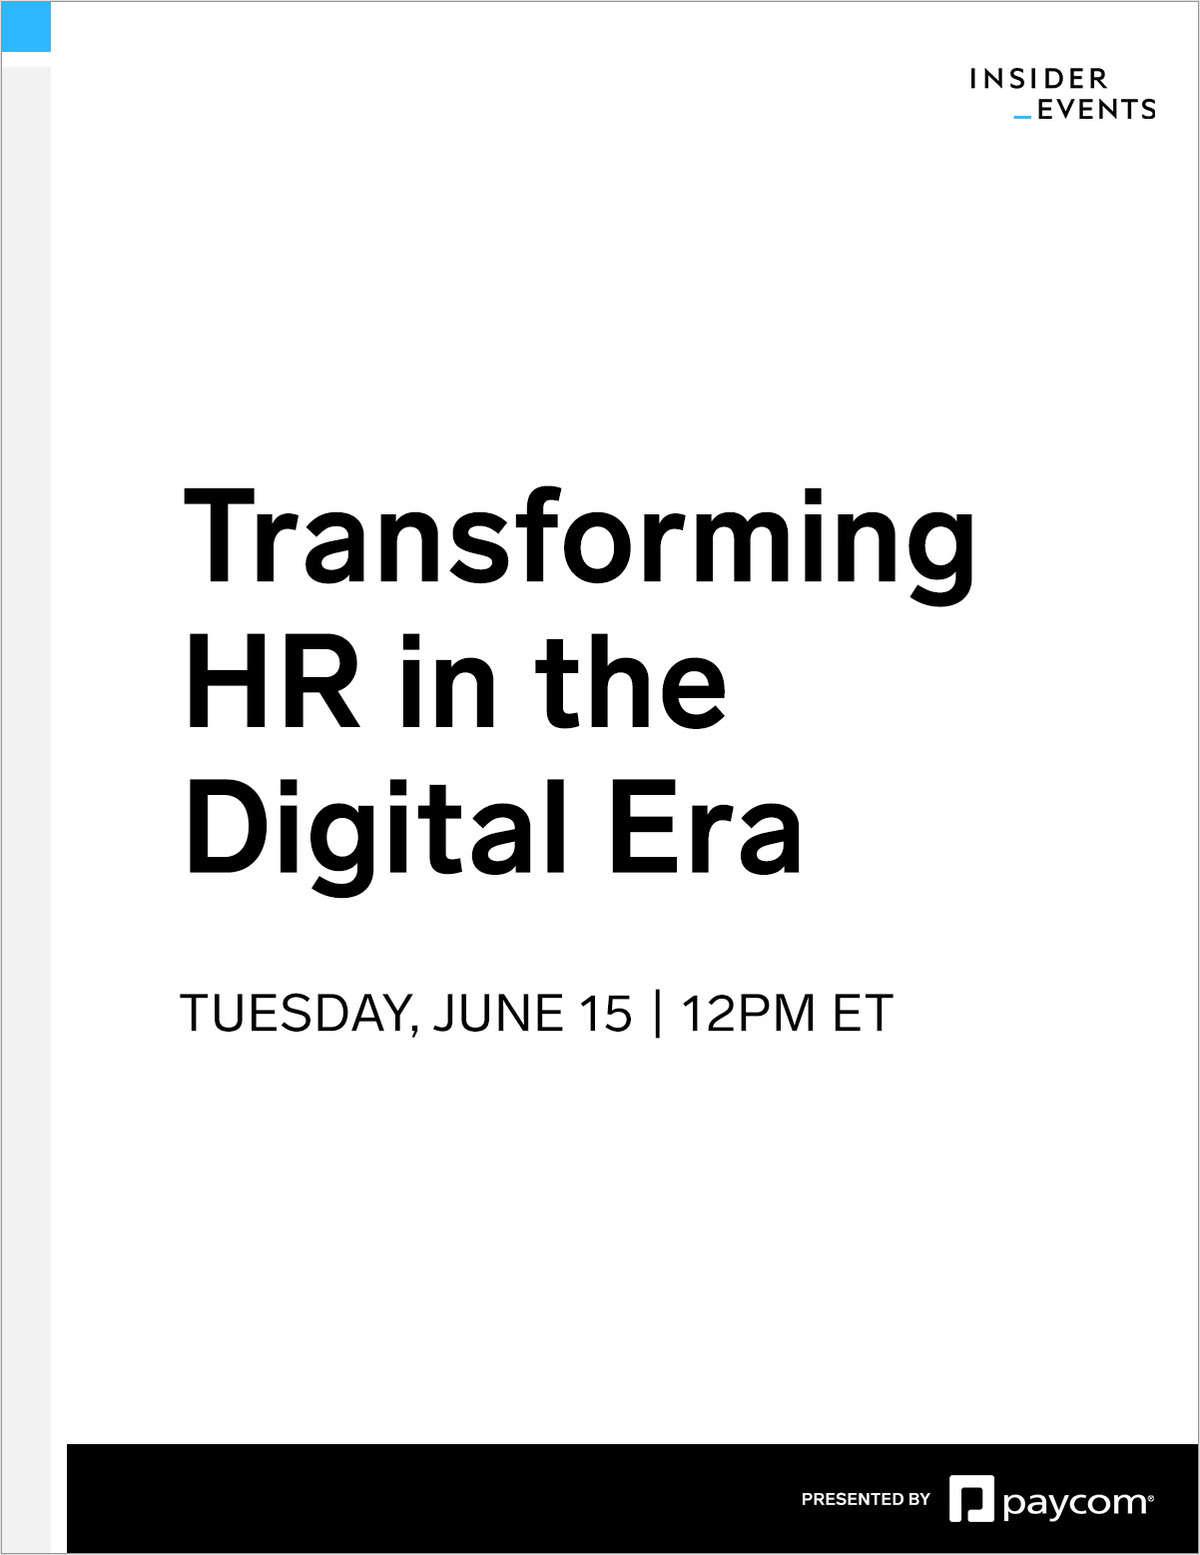 Transforming HR in the Digital Era